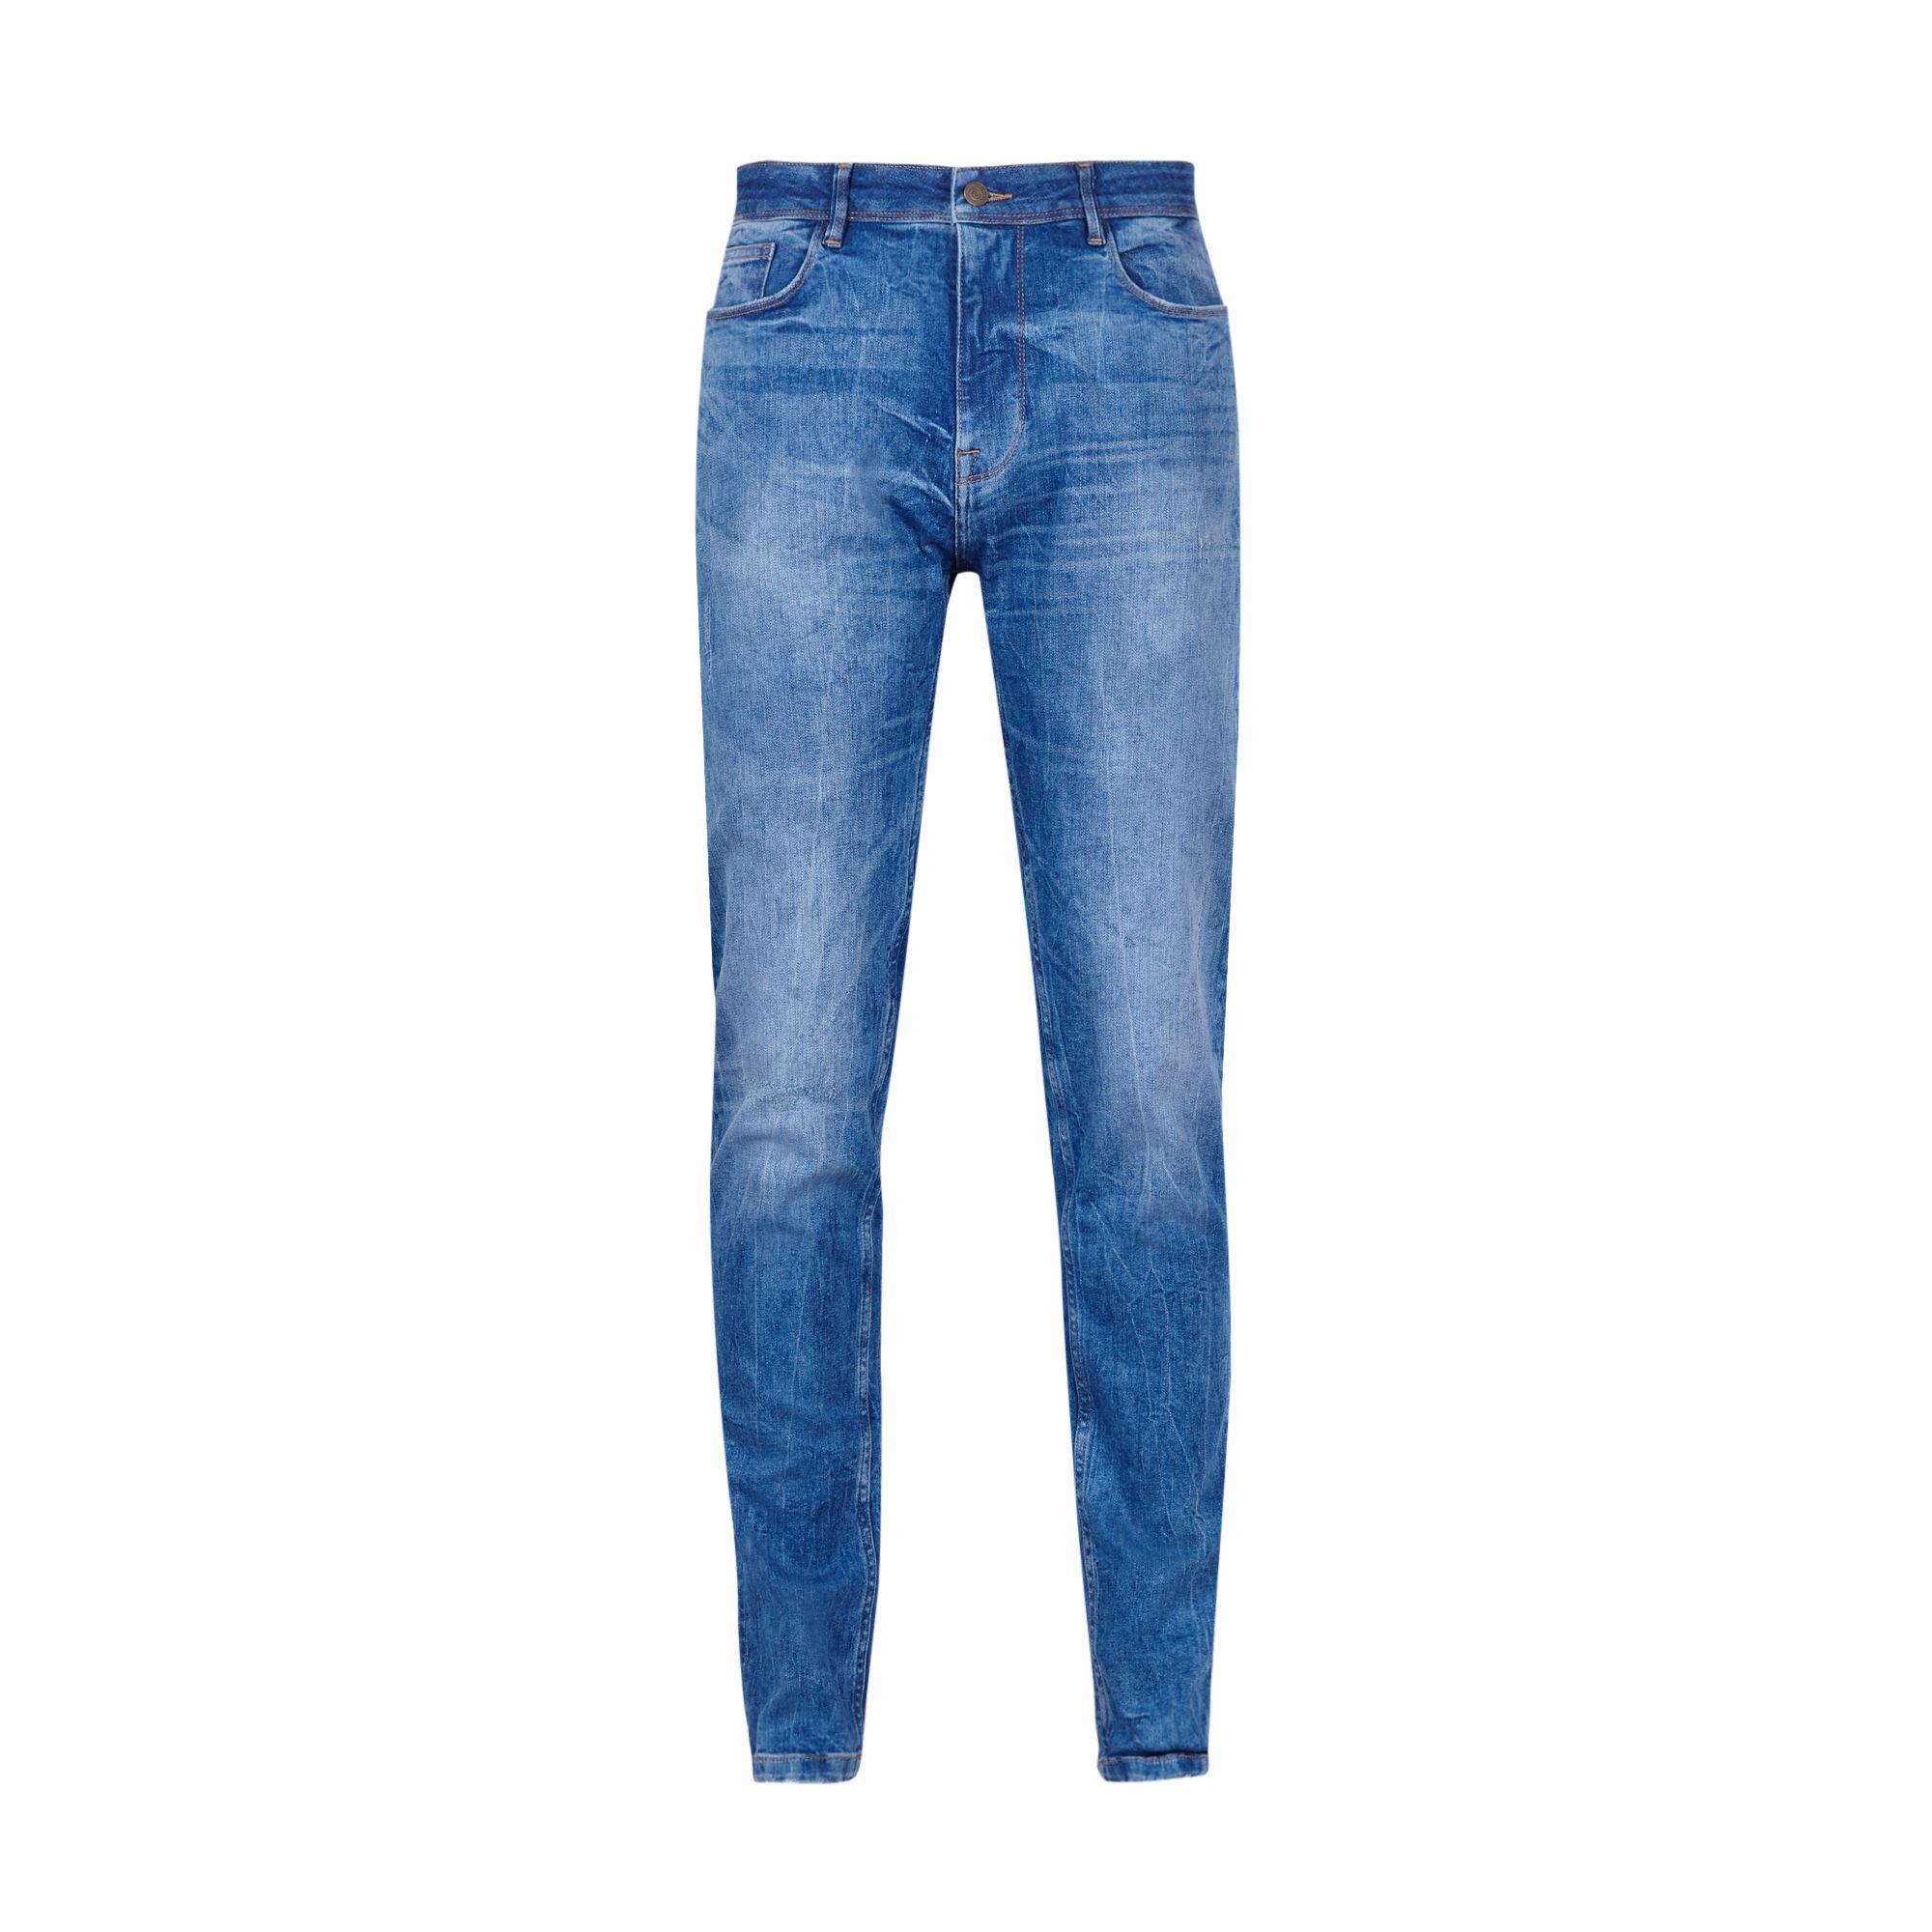 Burton Denim Hyper Blue Tapered Fit Jeans for Men